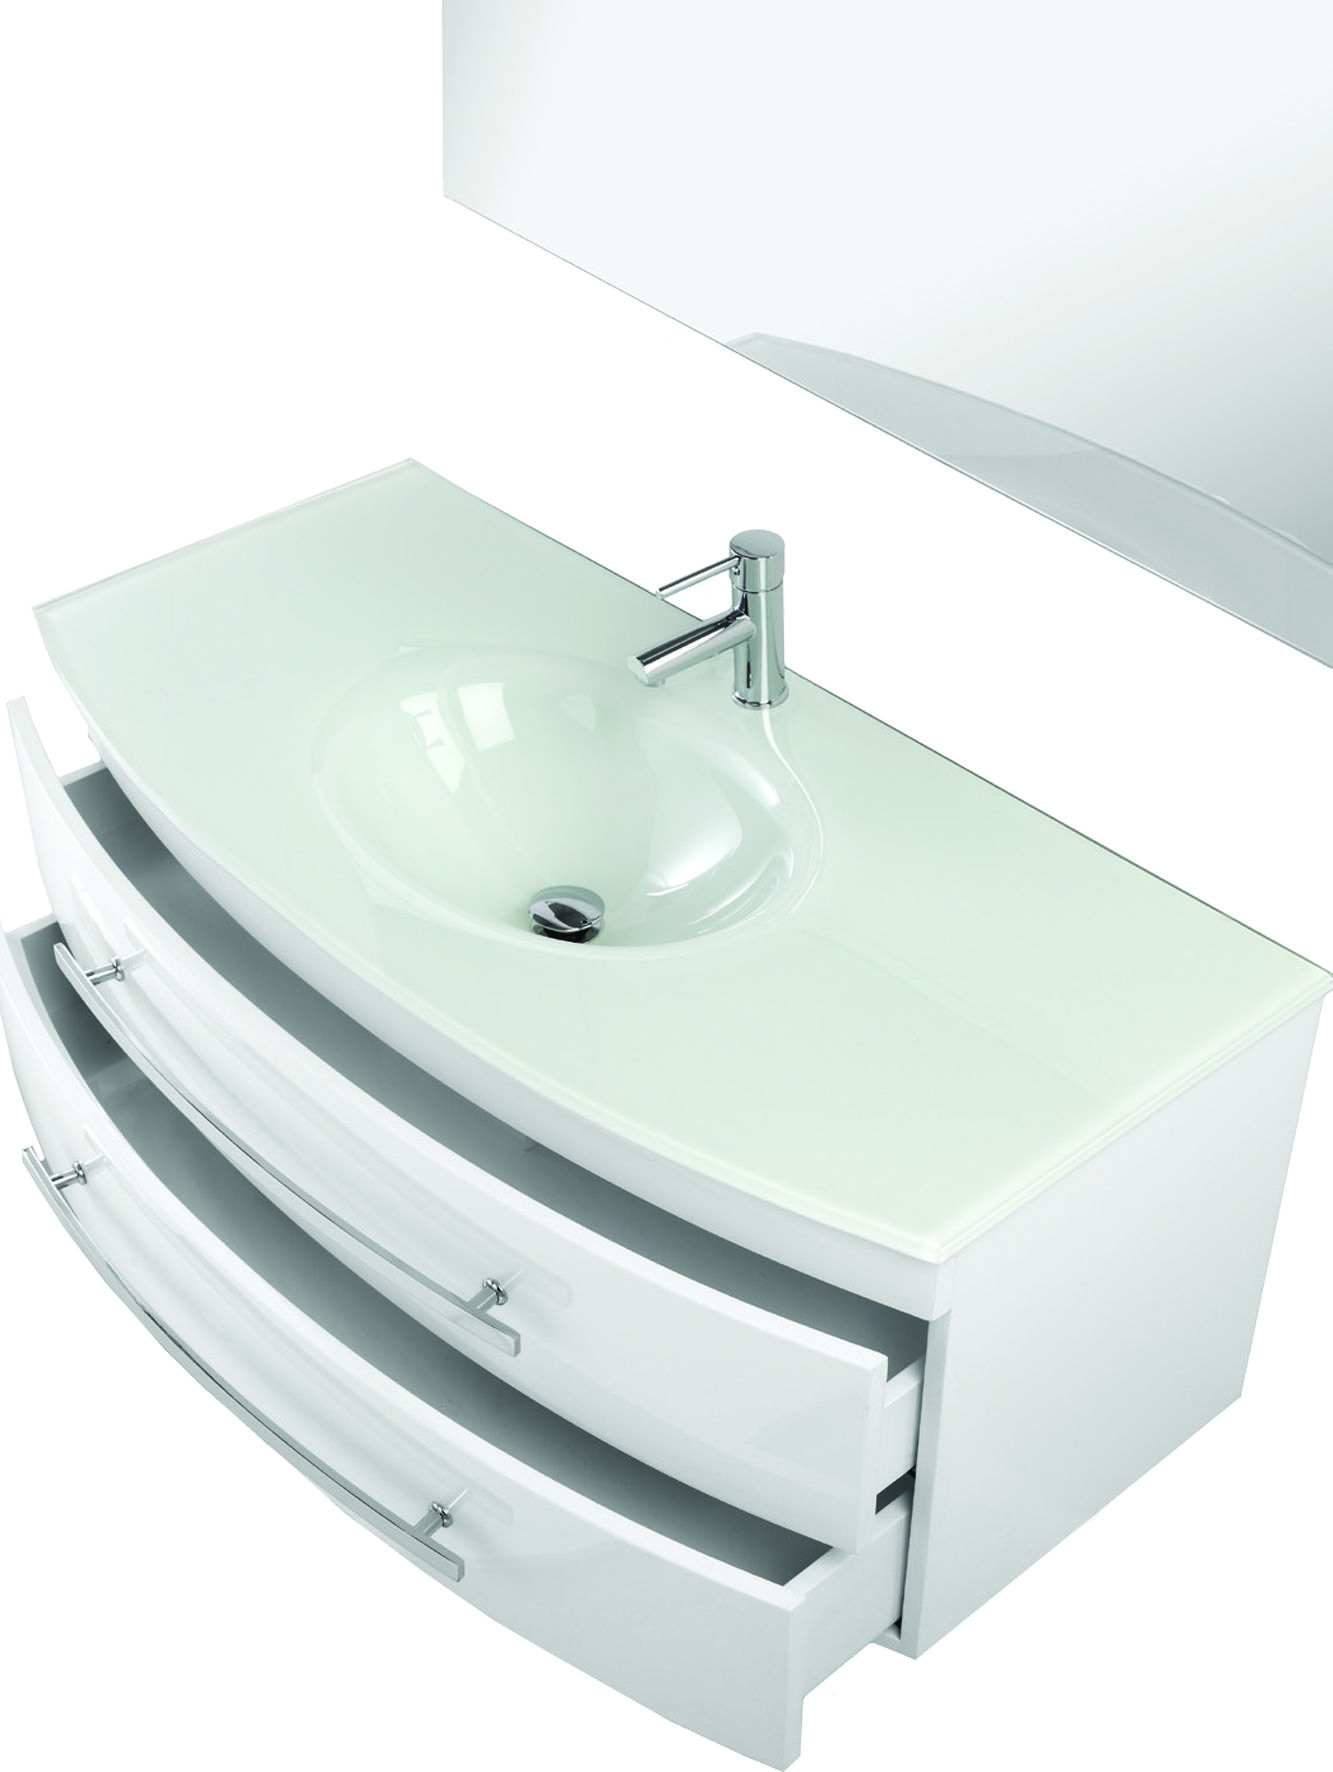 Arredobagno cm 110 in 3 colori tipo sospeso con lavabo in - Bagno largo 110 cm ...